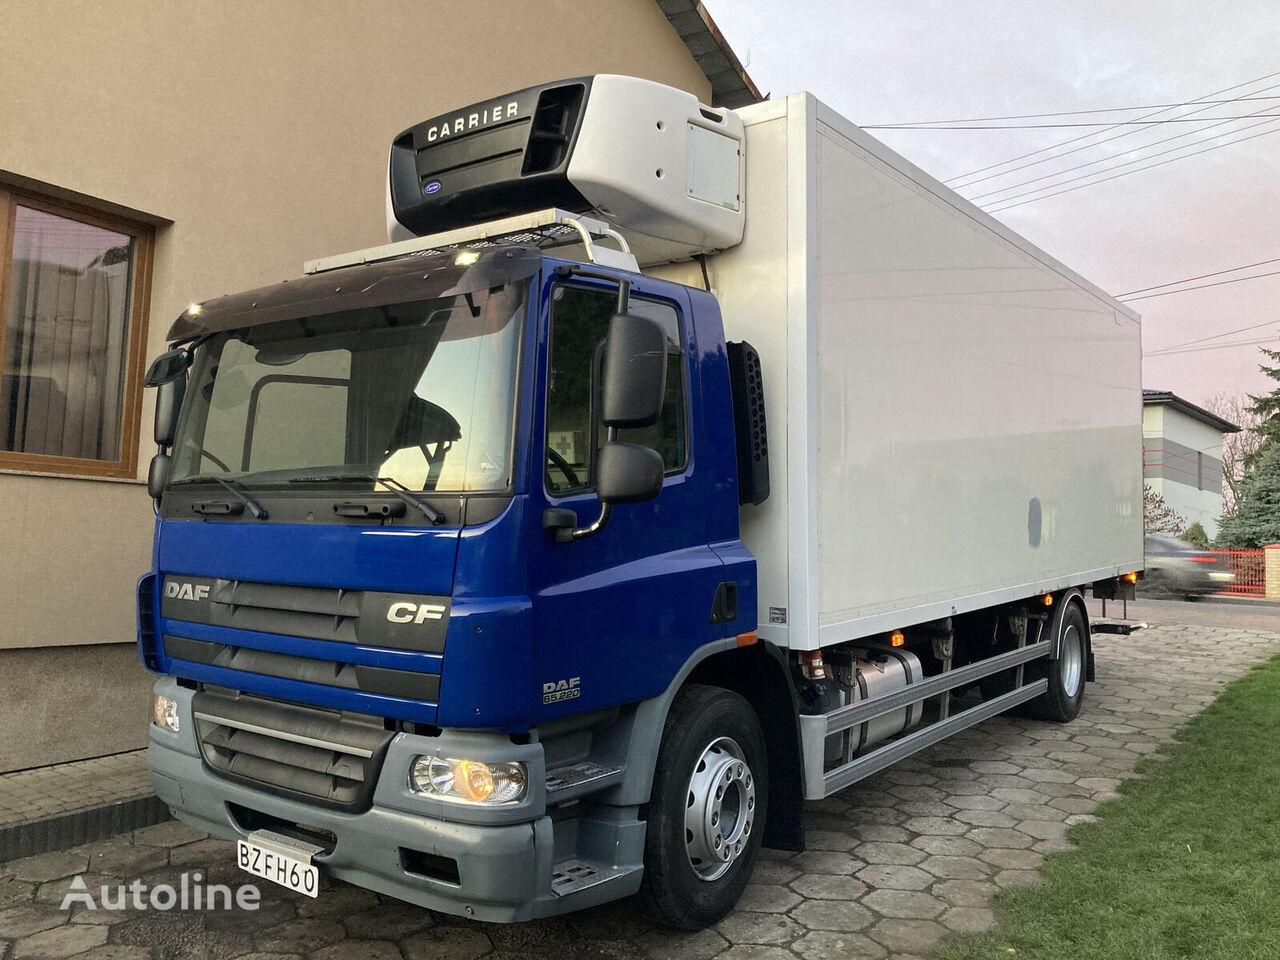 DAF cf 65 220 19000kg carrier supra 950 euro 5 drzwi-winda-270-0 camión frigorífico